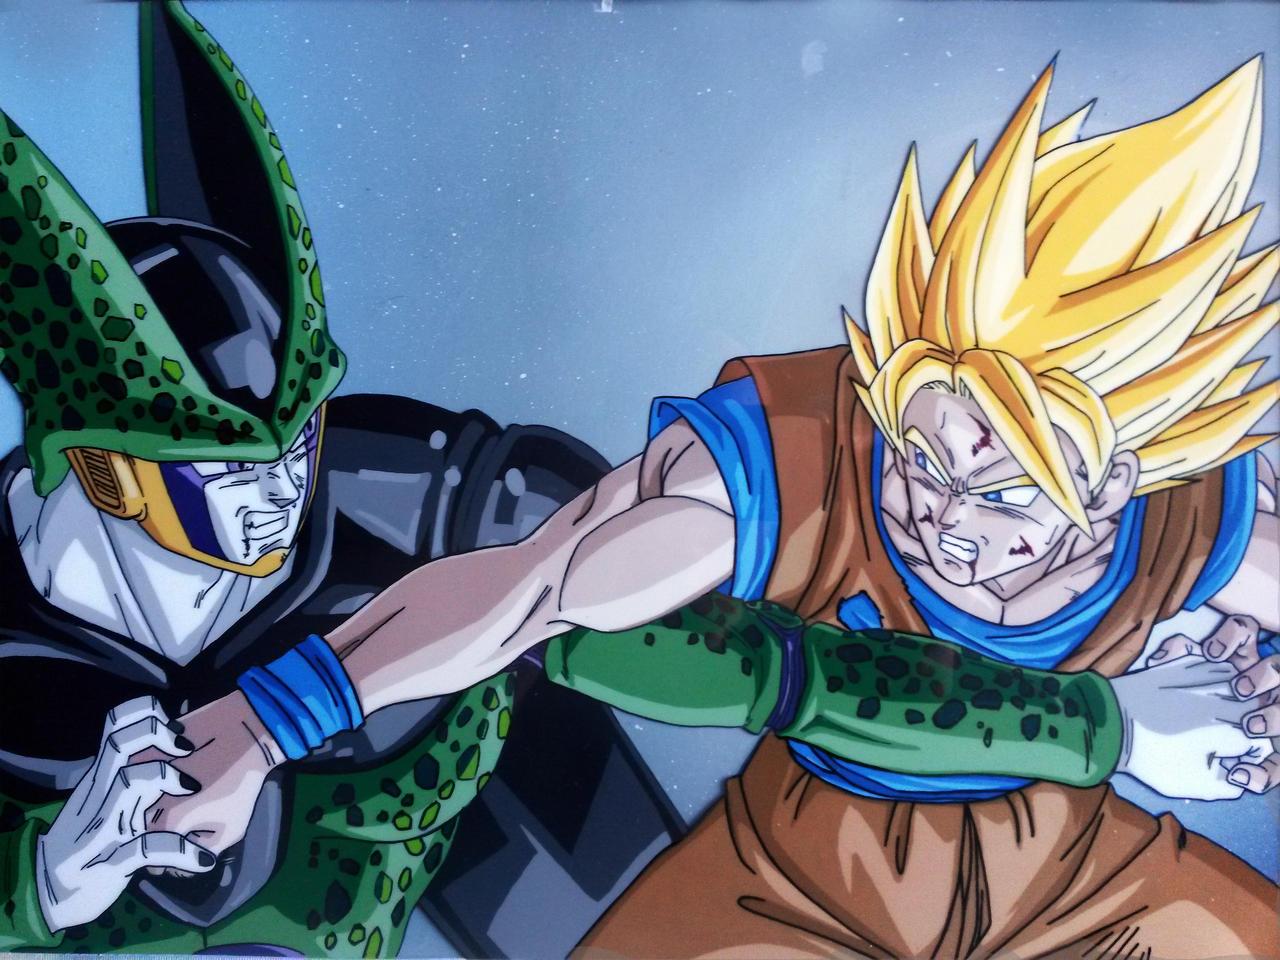 Cell Vs Goku by tenro1 on DeviantArt